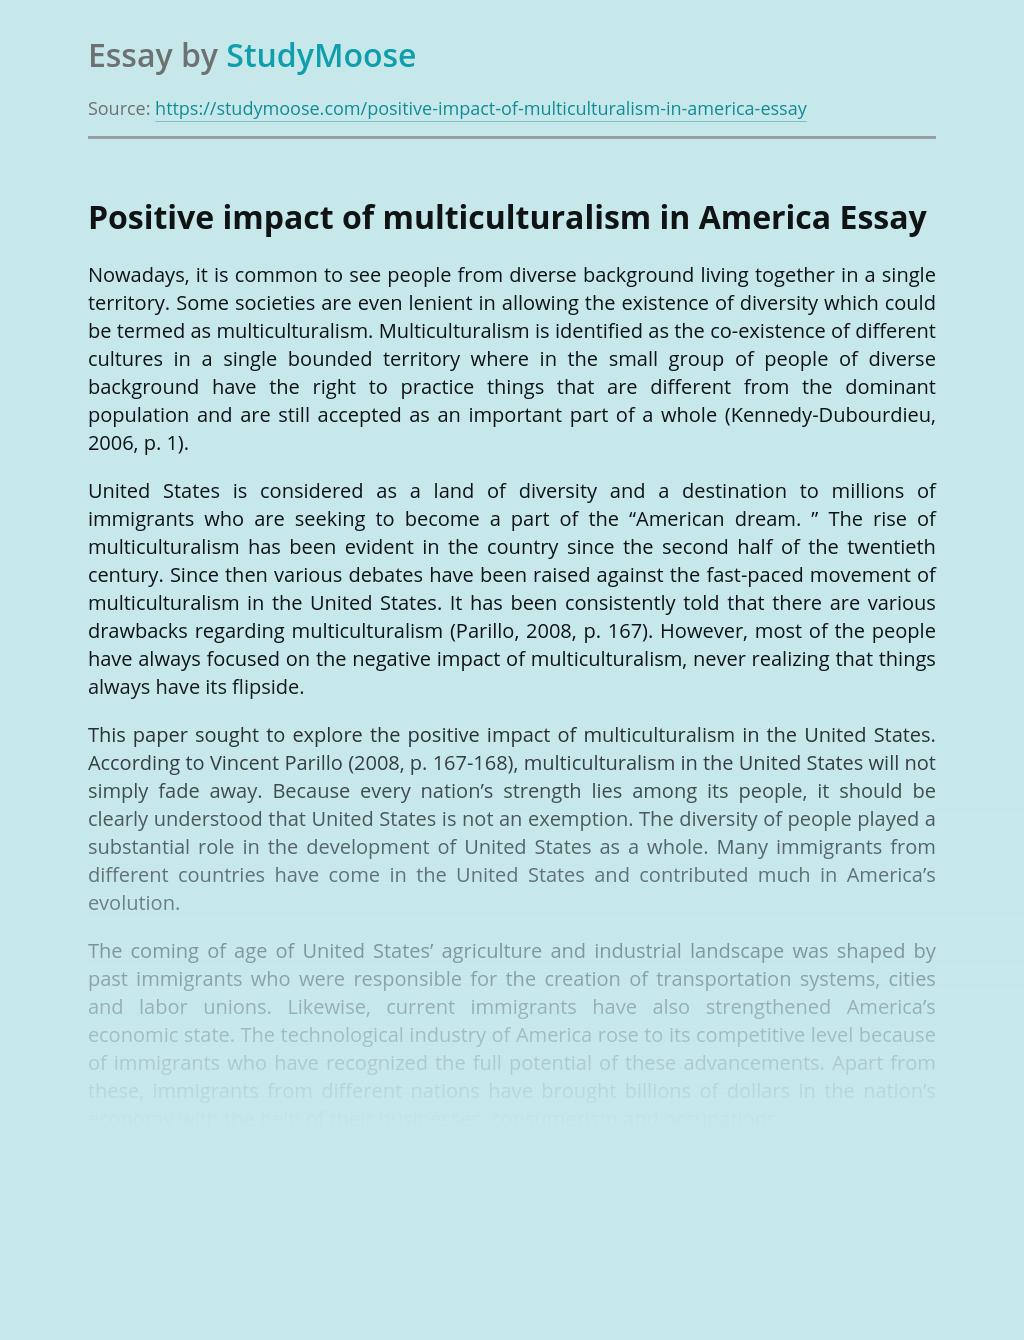 Positive impact of multiculturalism in America